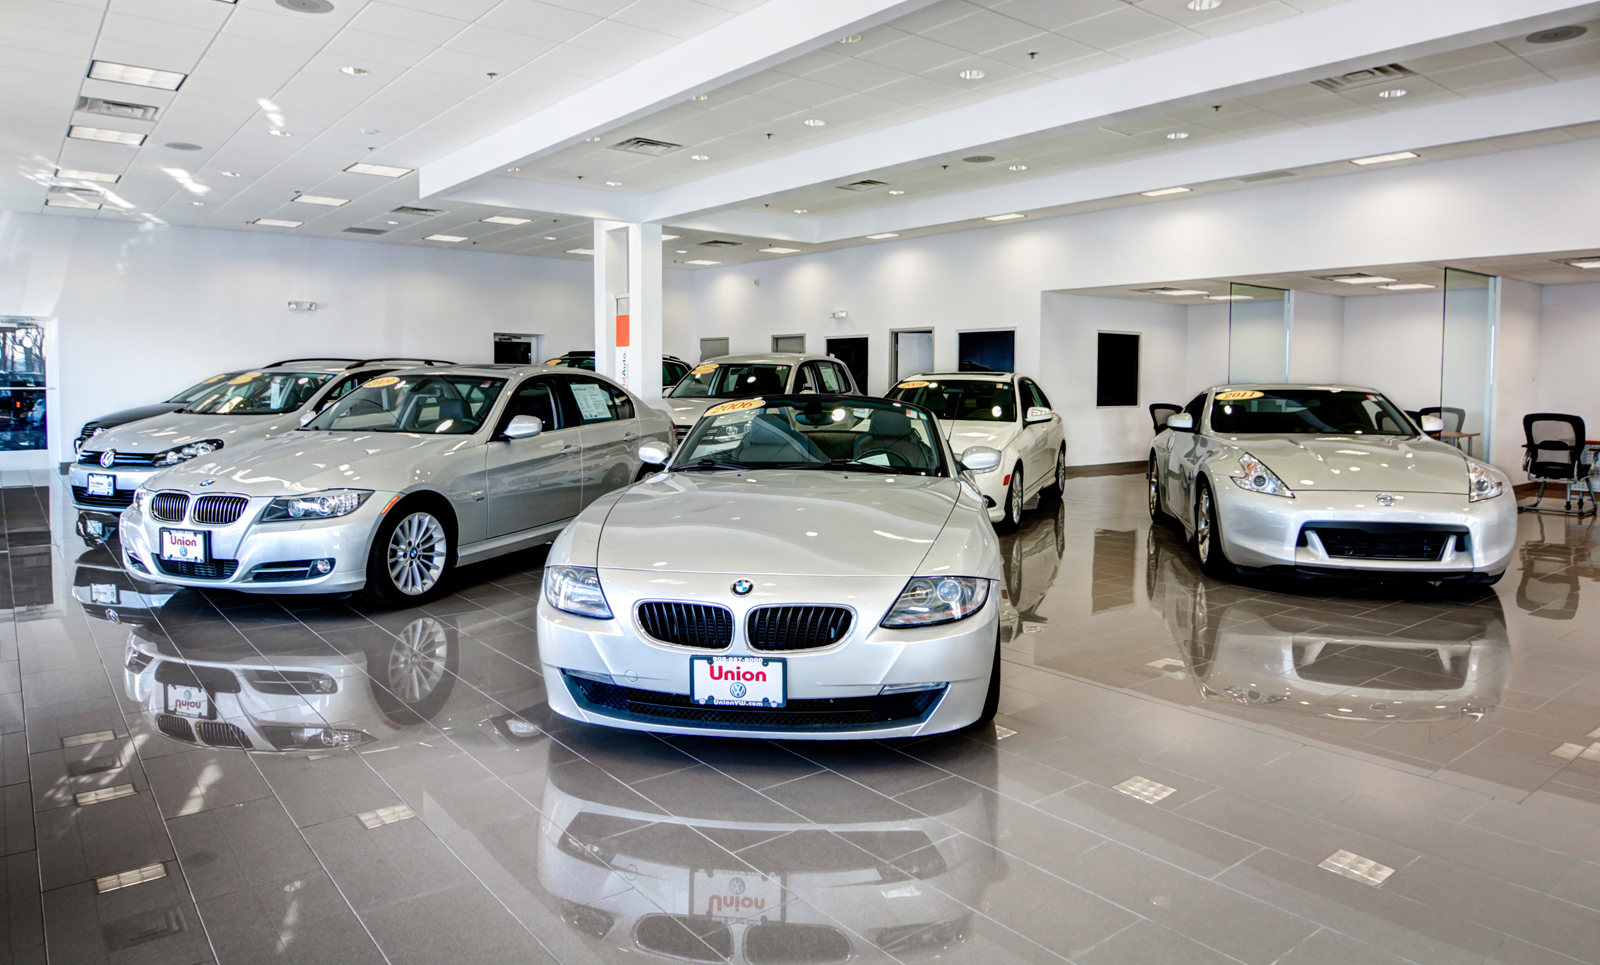 Union Volkswagen - New Jersey - Google Business View - NJ